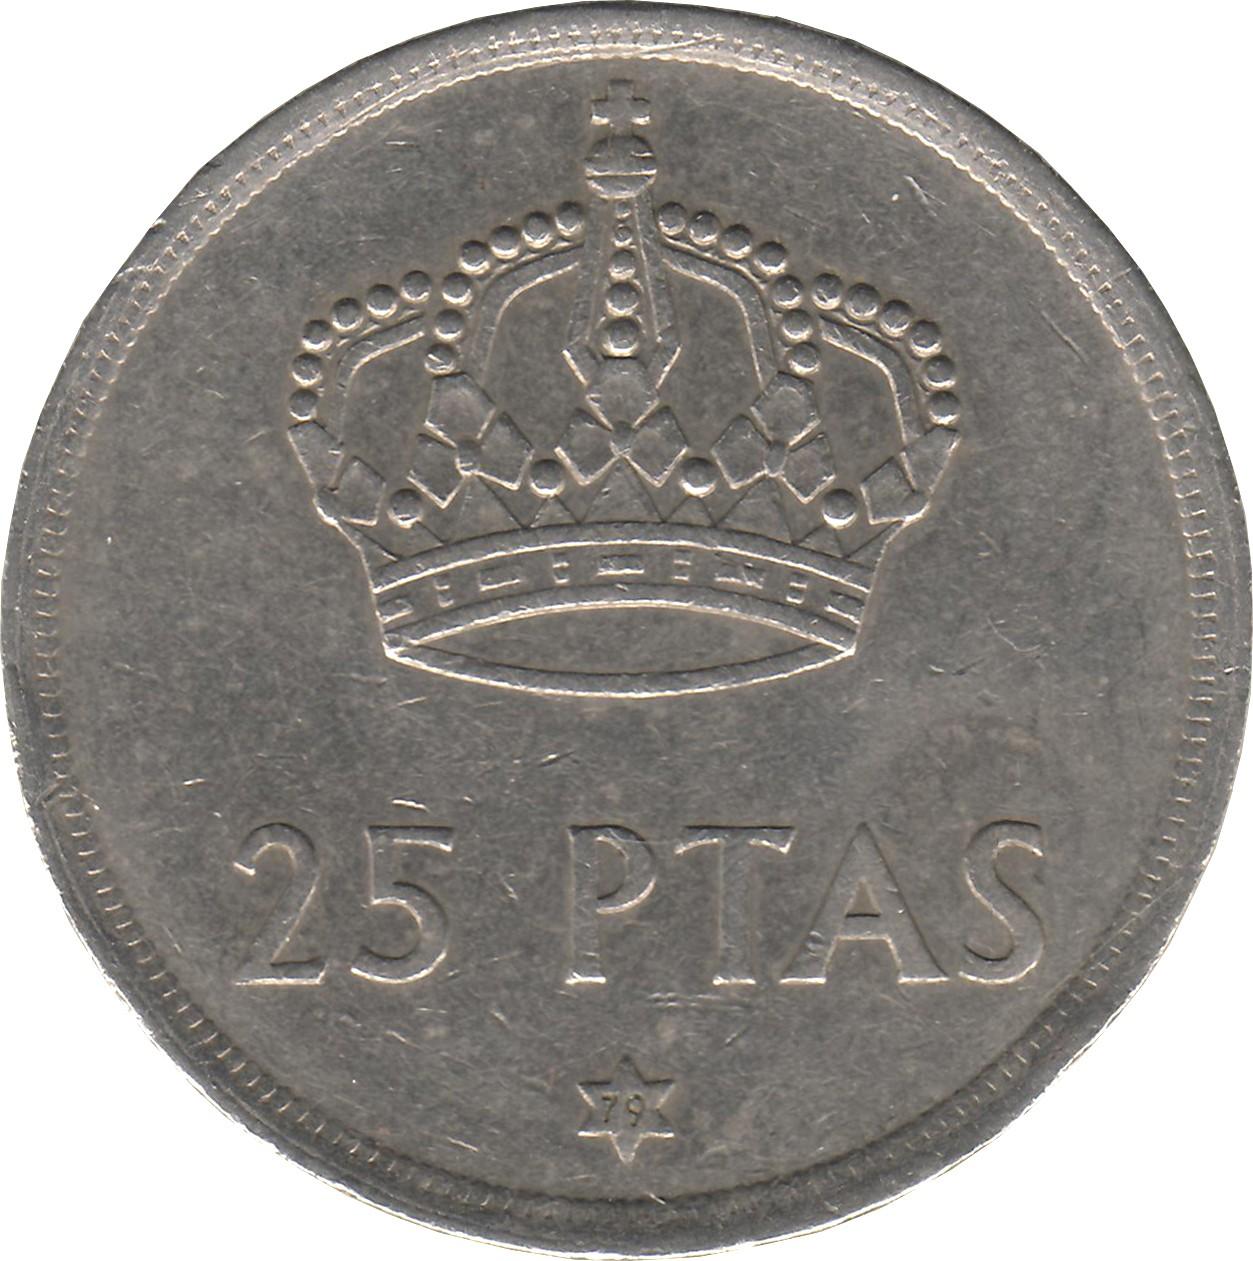 Spain 25 Pesetas (1975)